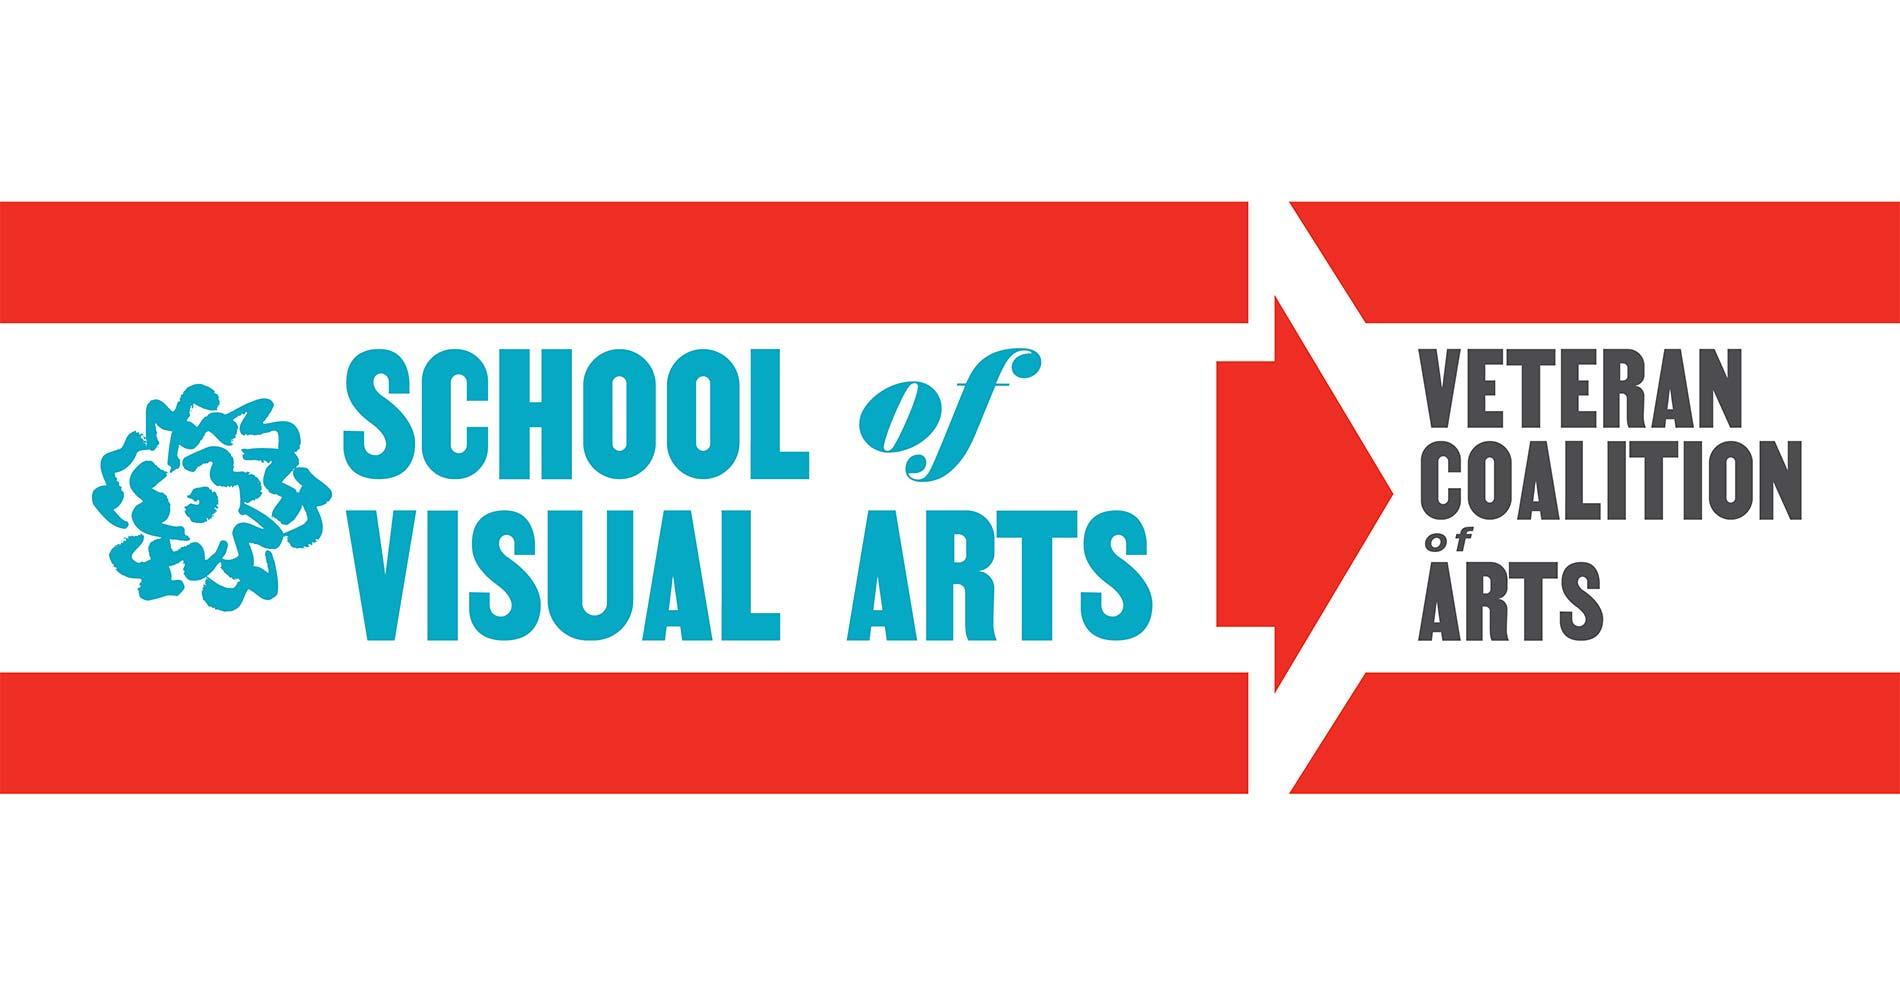 SVA's Veteran Coalition of Arts banner designed by the Visual Arts Press.